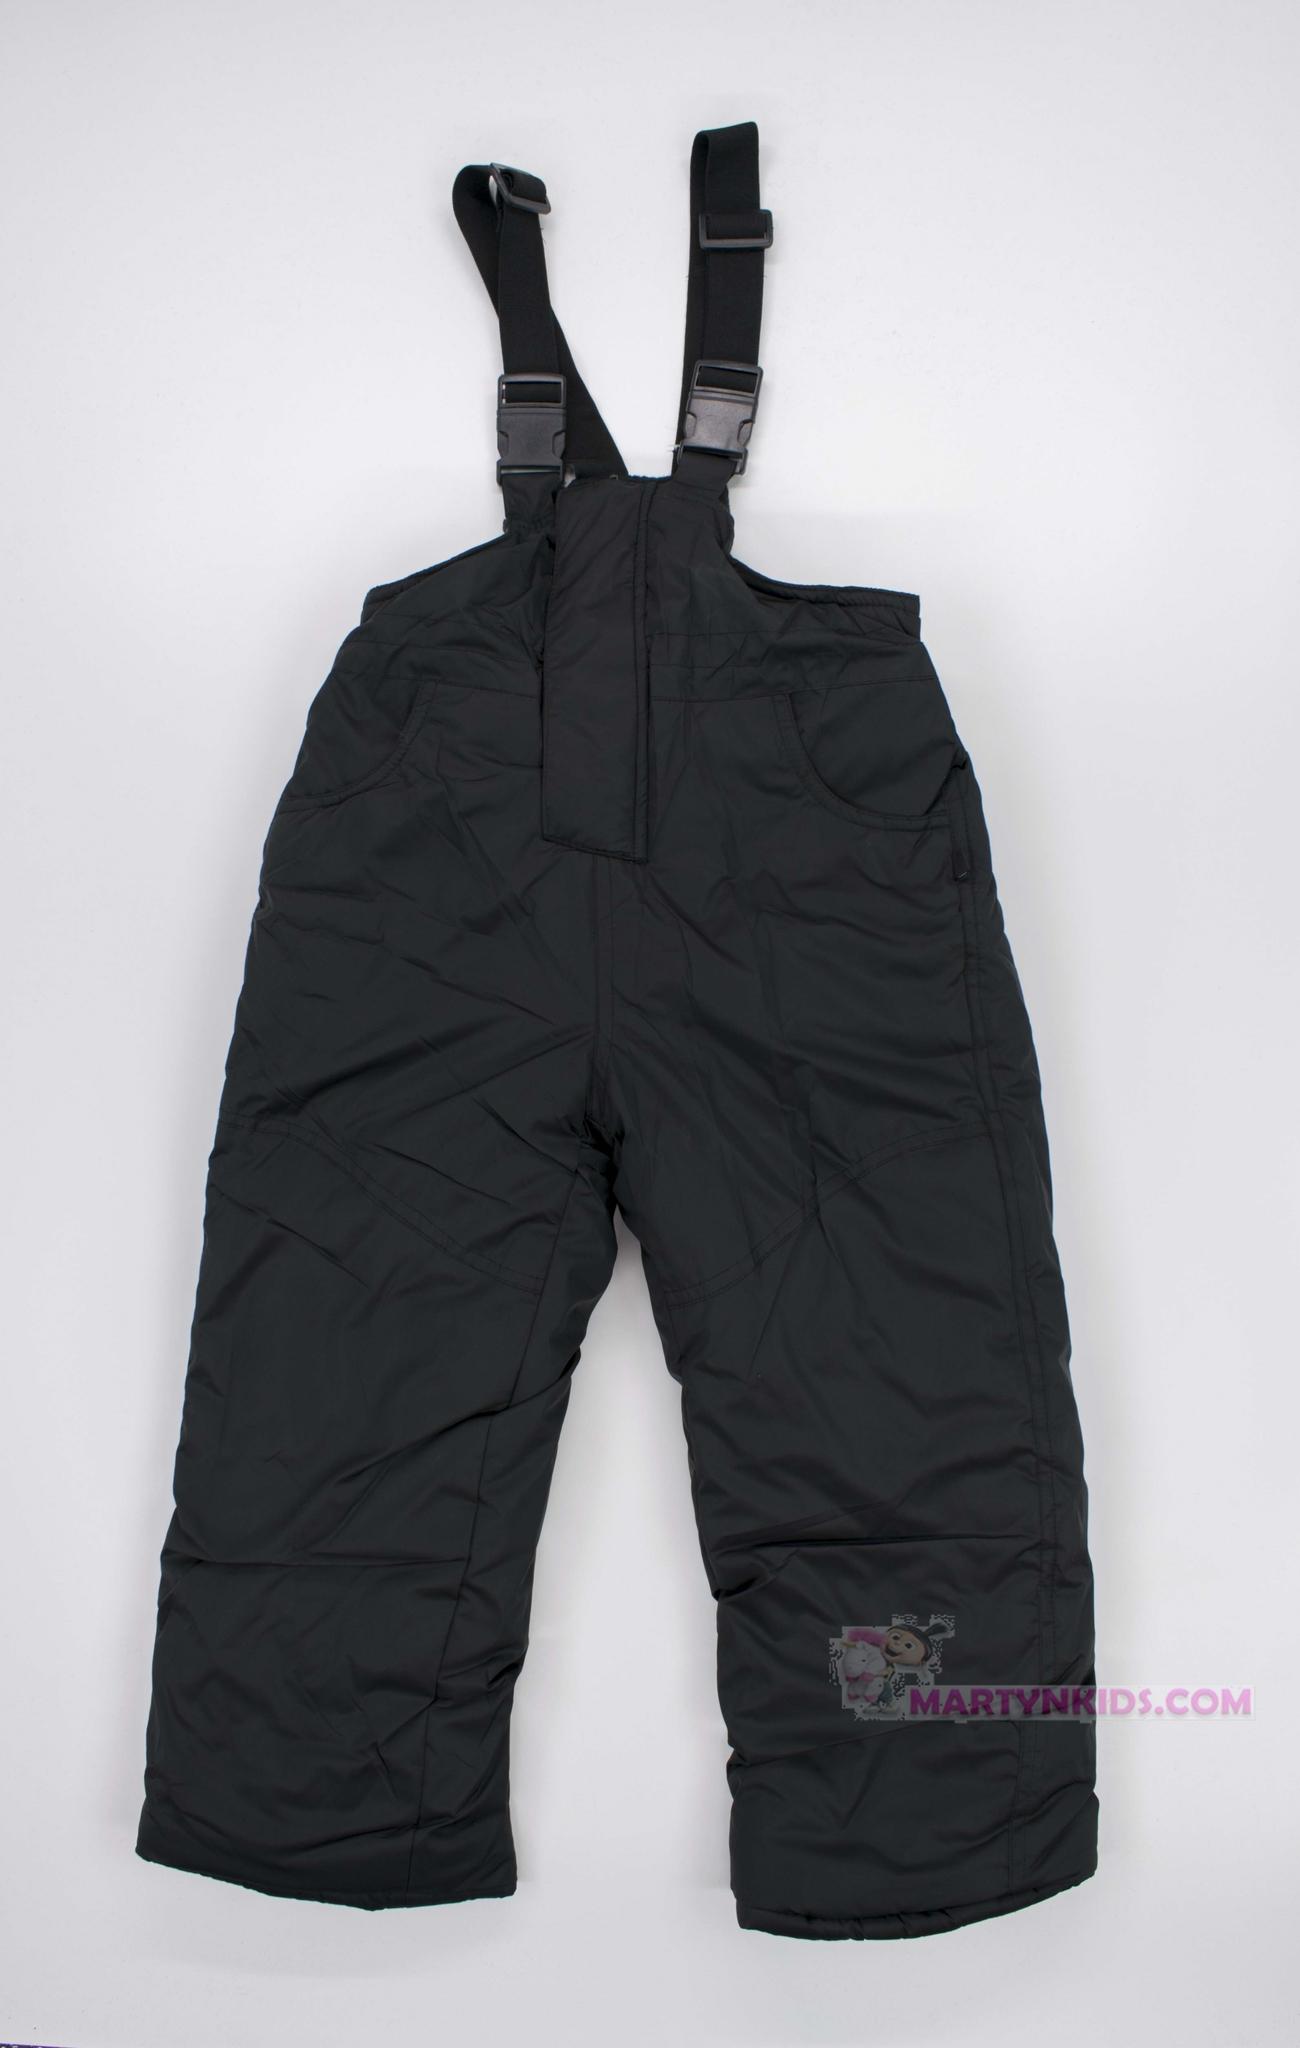 2874 зима штаны с лямками малышки 05